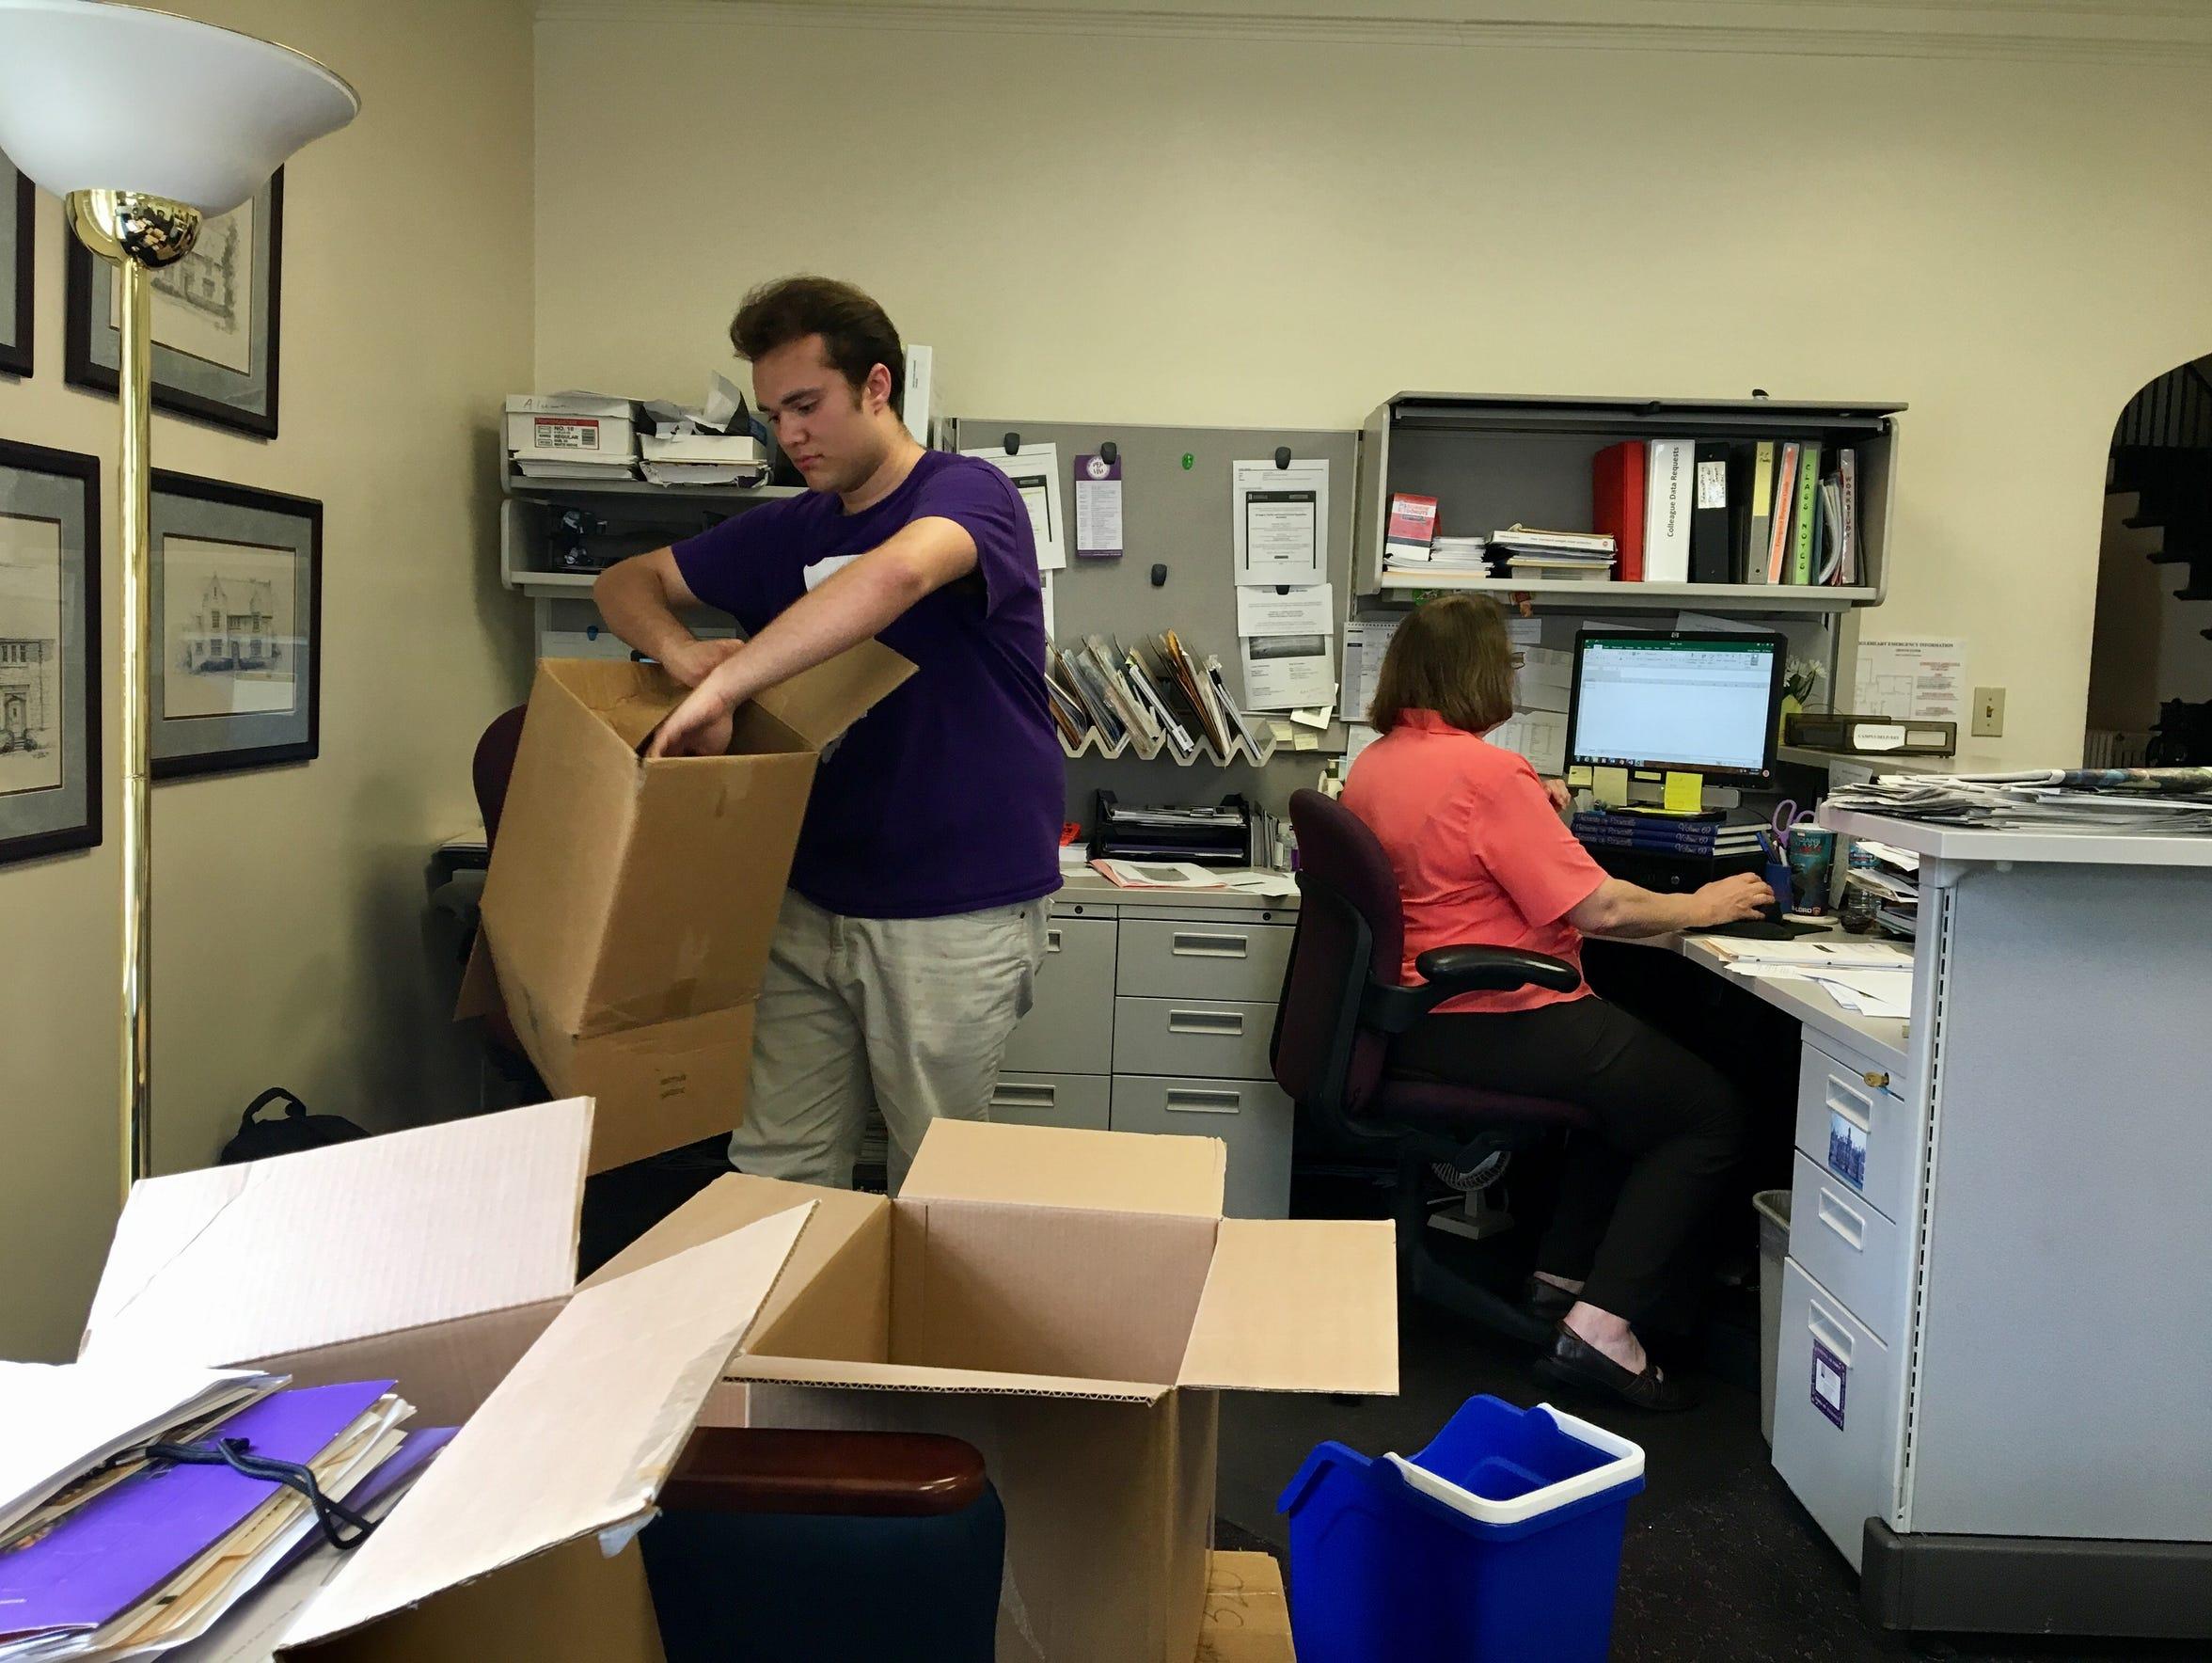 Rafael Pereira breaks down boxes at his campus job